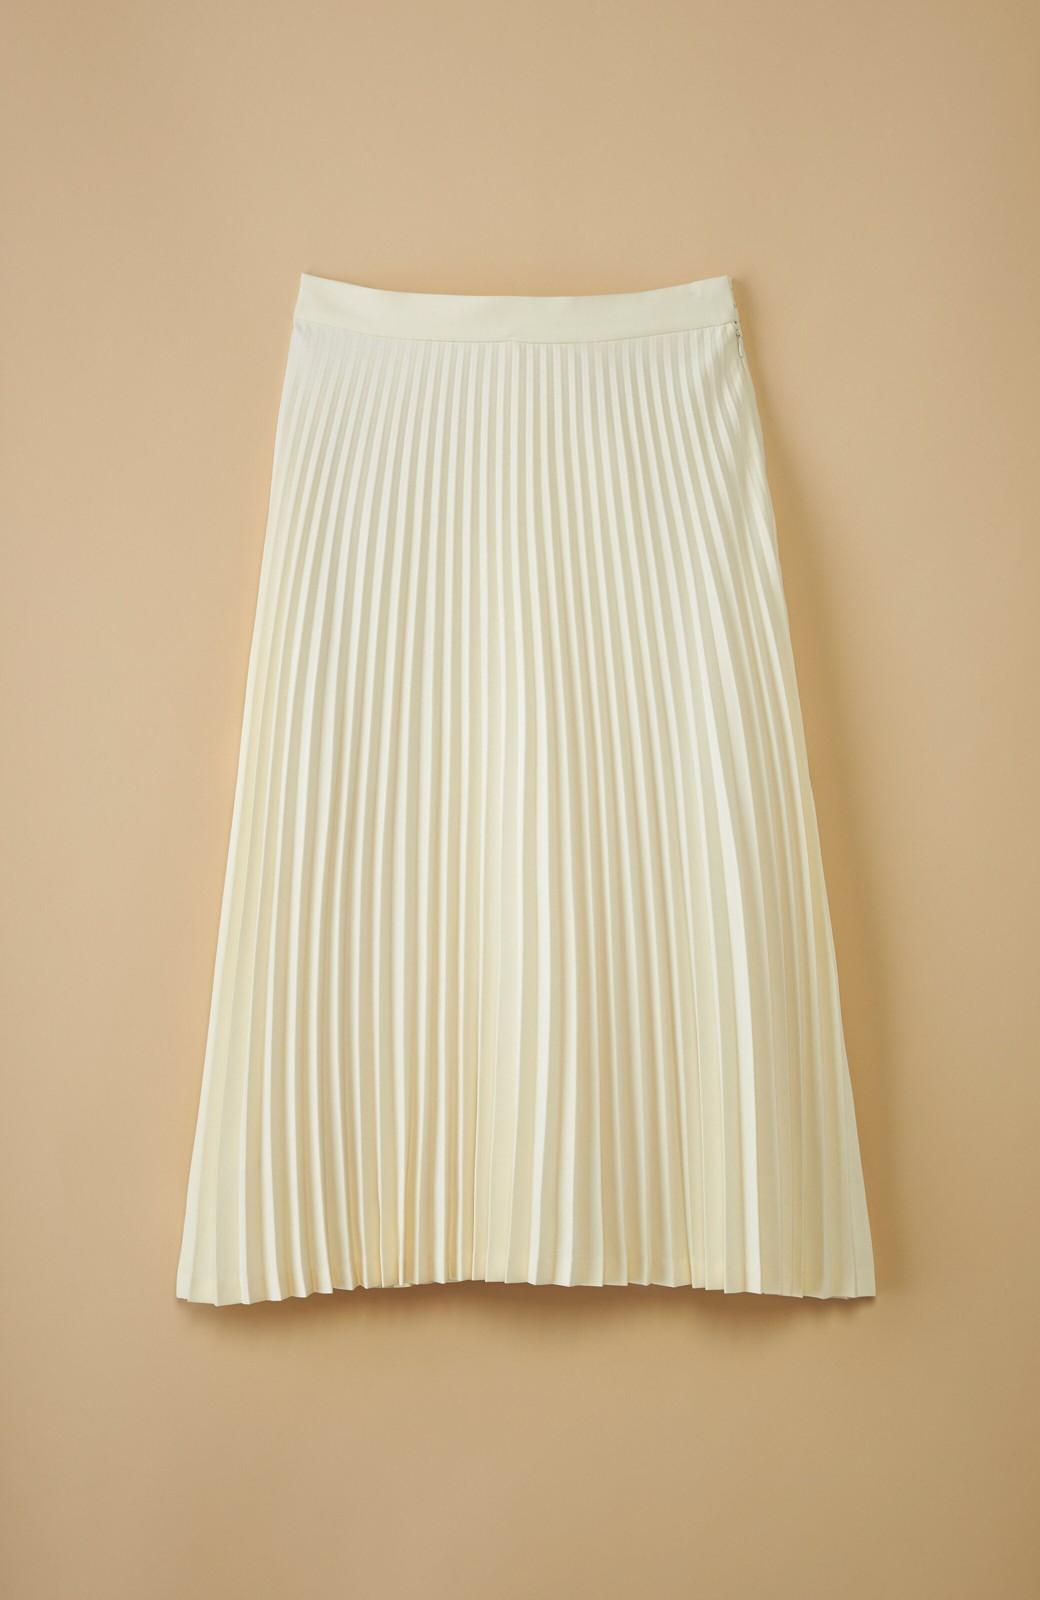 haco! 【mer11月号掲載】折り目正しい大人のためのプリーツスカート by que made me <アイボリー>の商品写真1